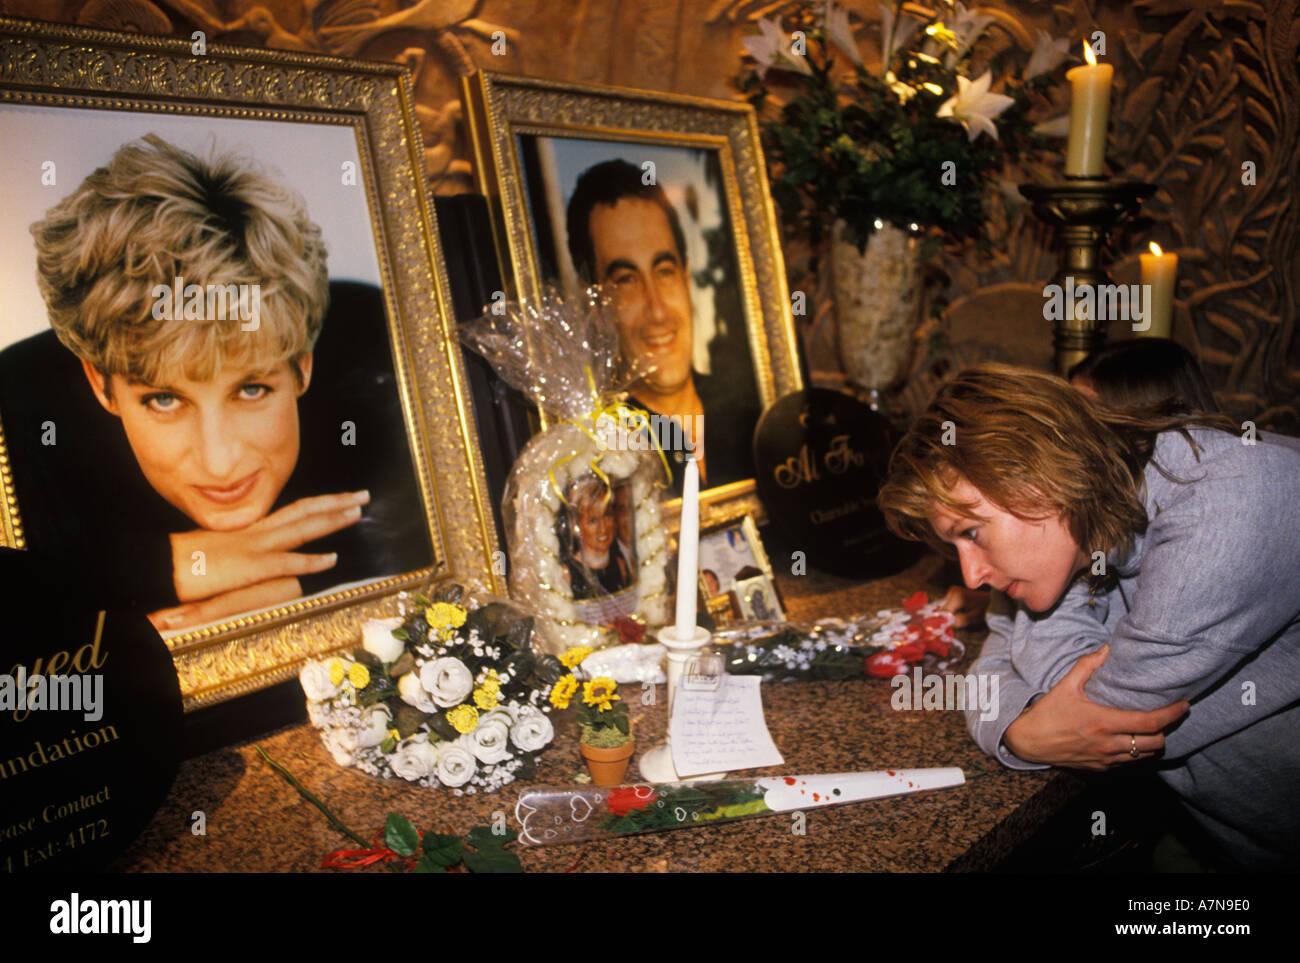 Prinzessin Diana von Wales und Dodi Fayed Mahnmal im Kaufhaus Harrods Knightsbridge London England 1997 1990 s UK HOMER SYKES Stockbild